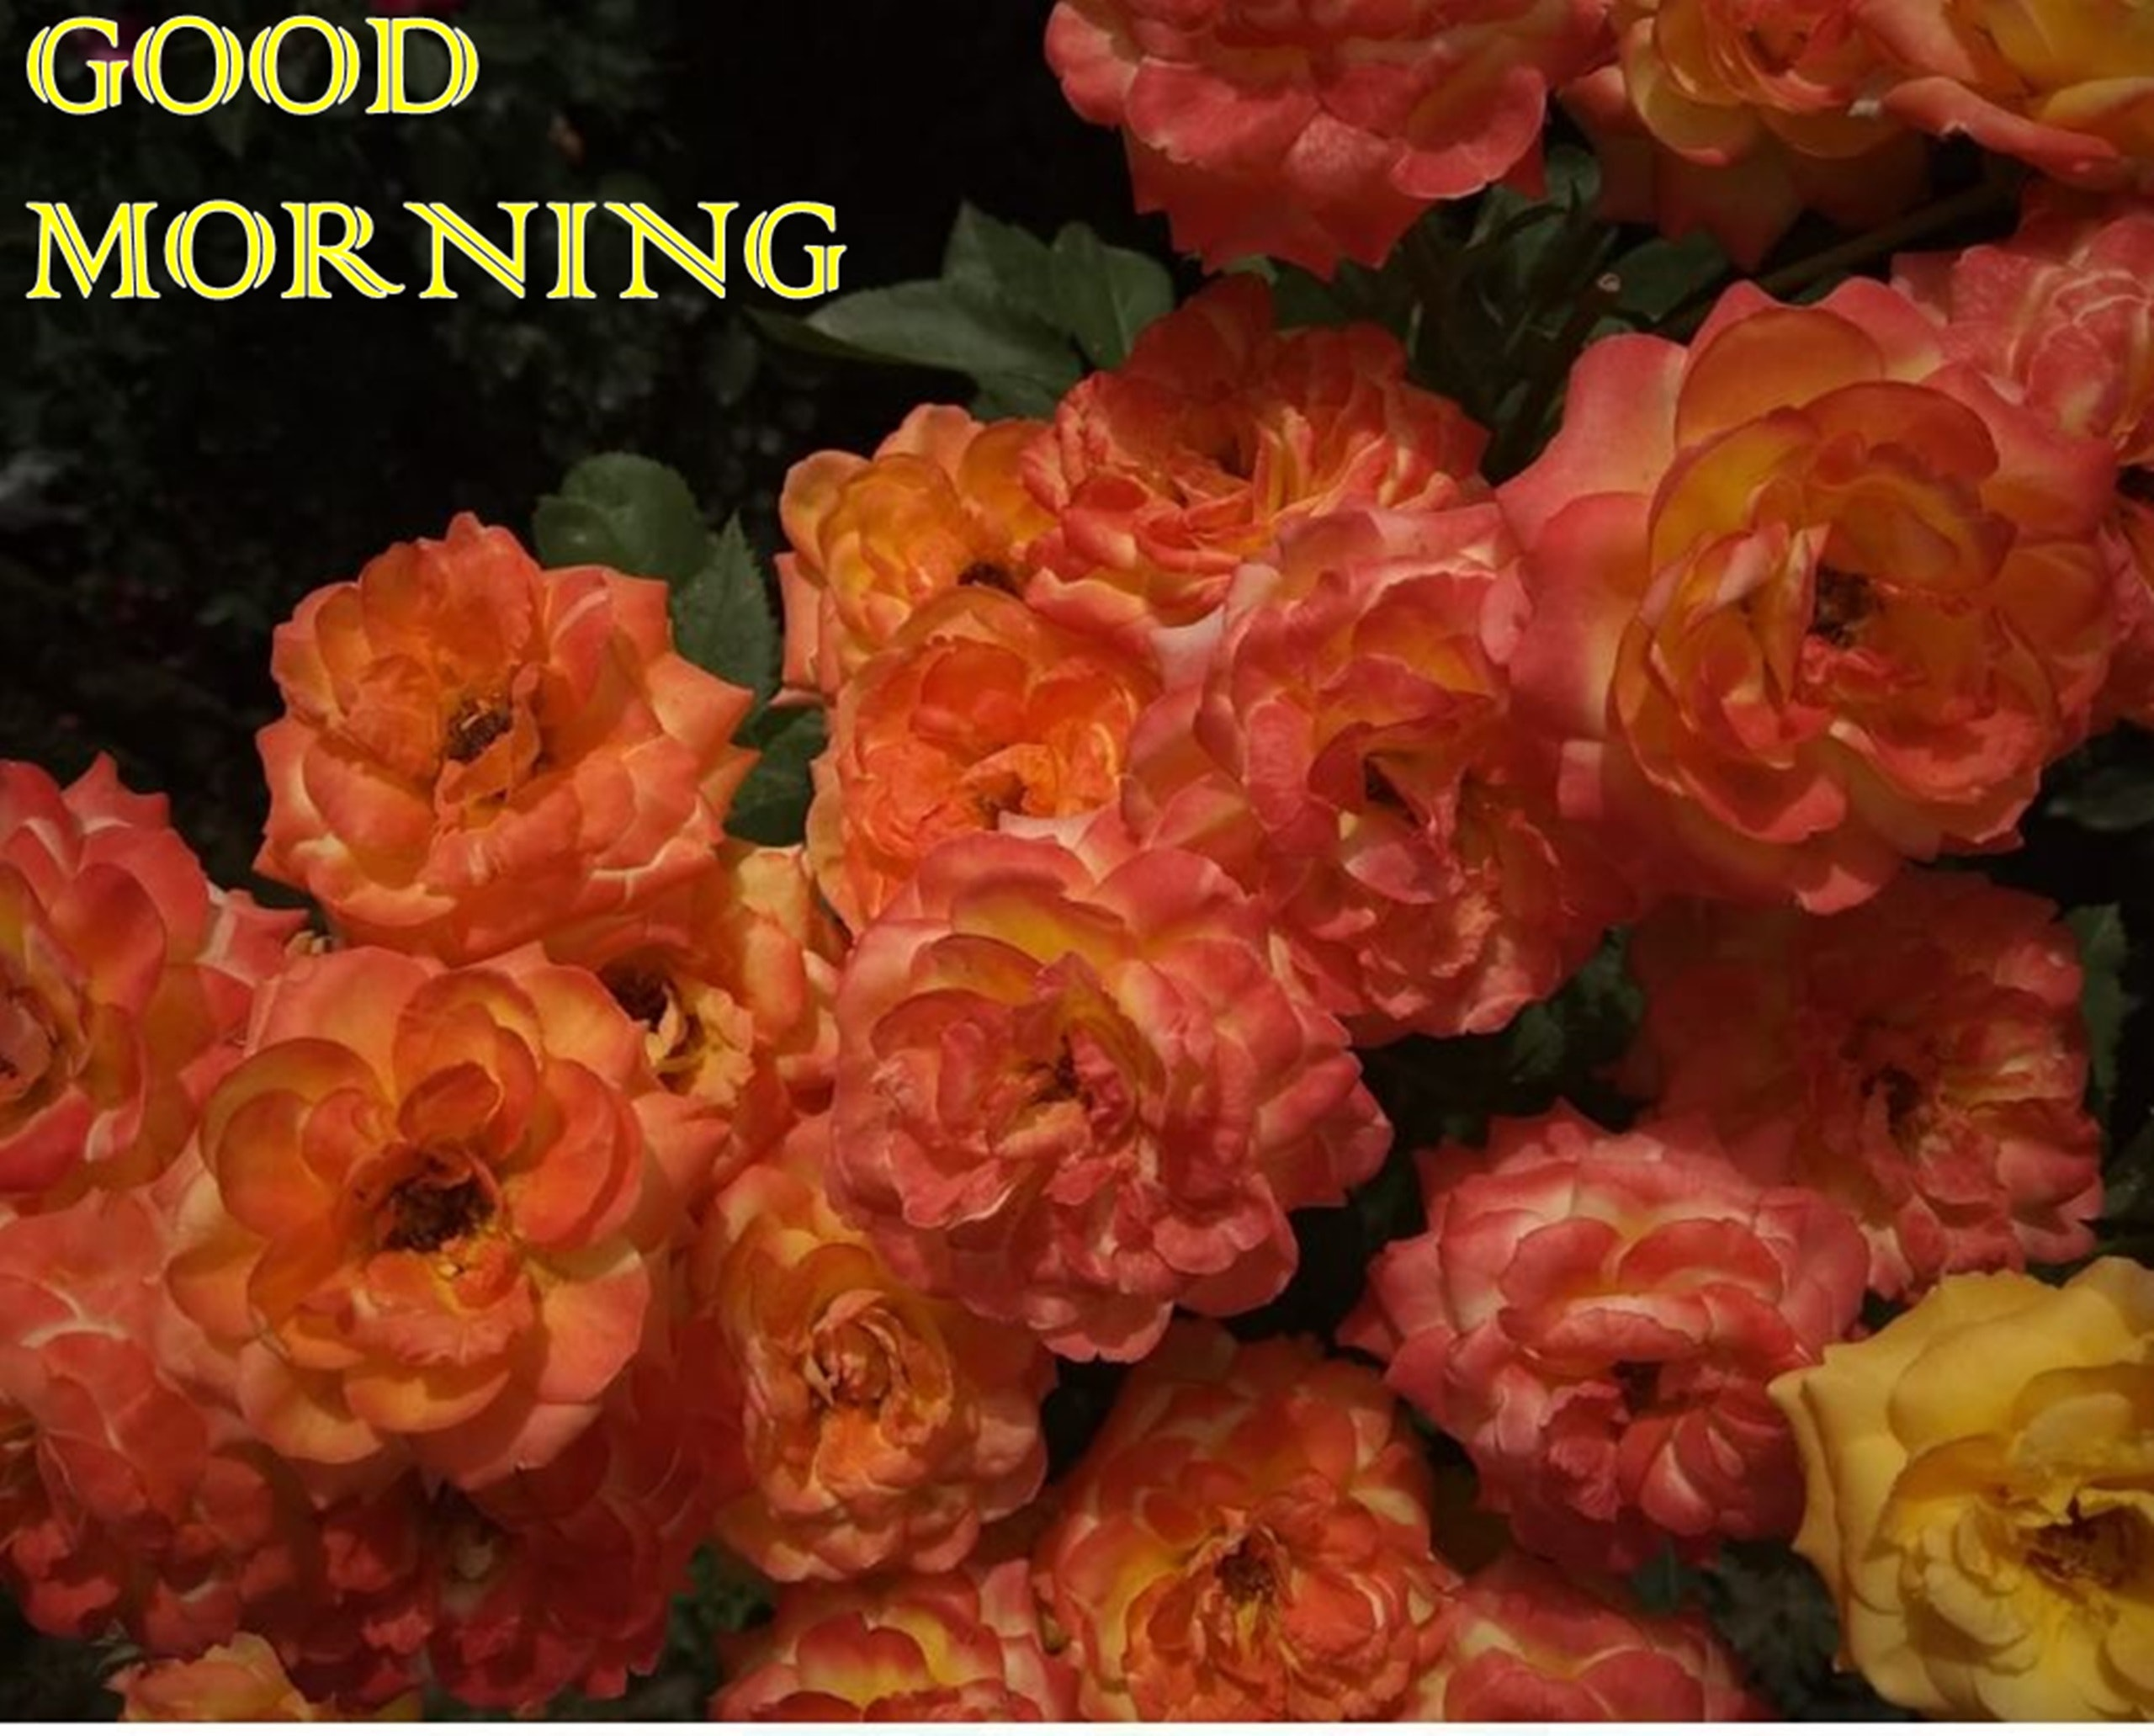 Free Stock Photo Of Flowers Garden Good Morning